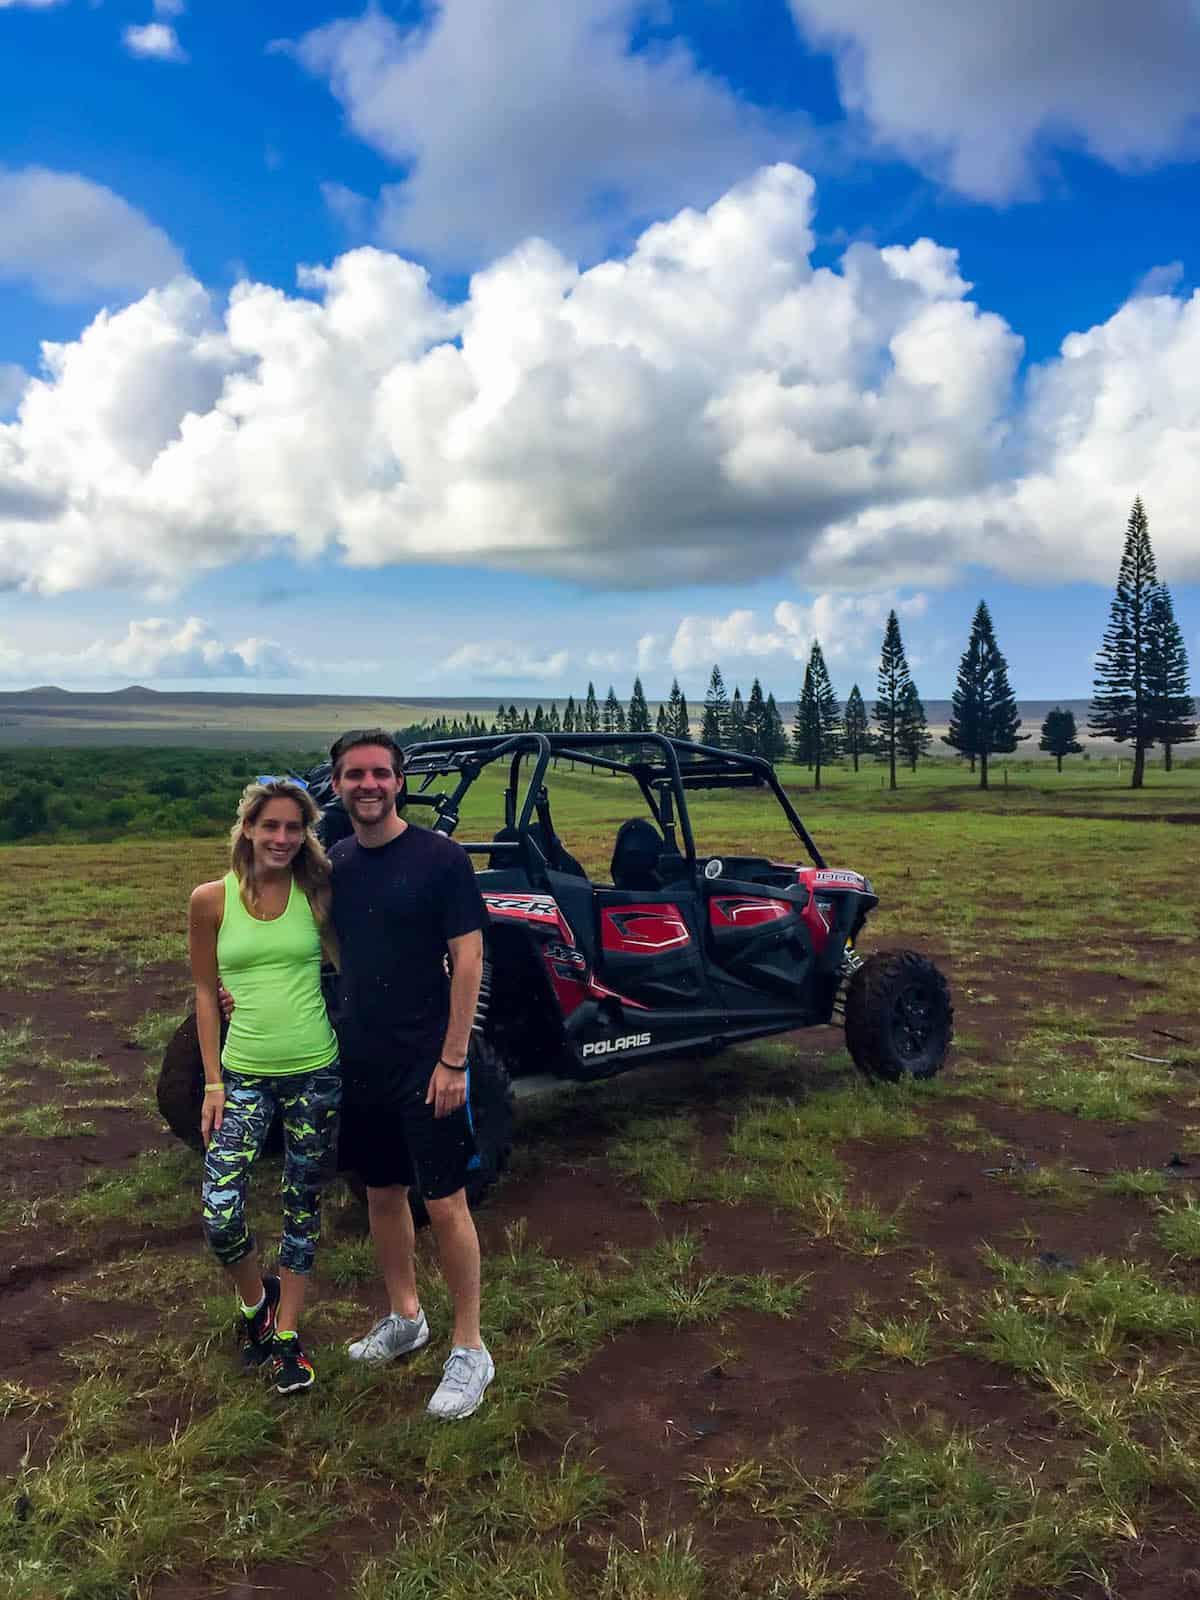 UTV Tour Lanai Island Hawaii